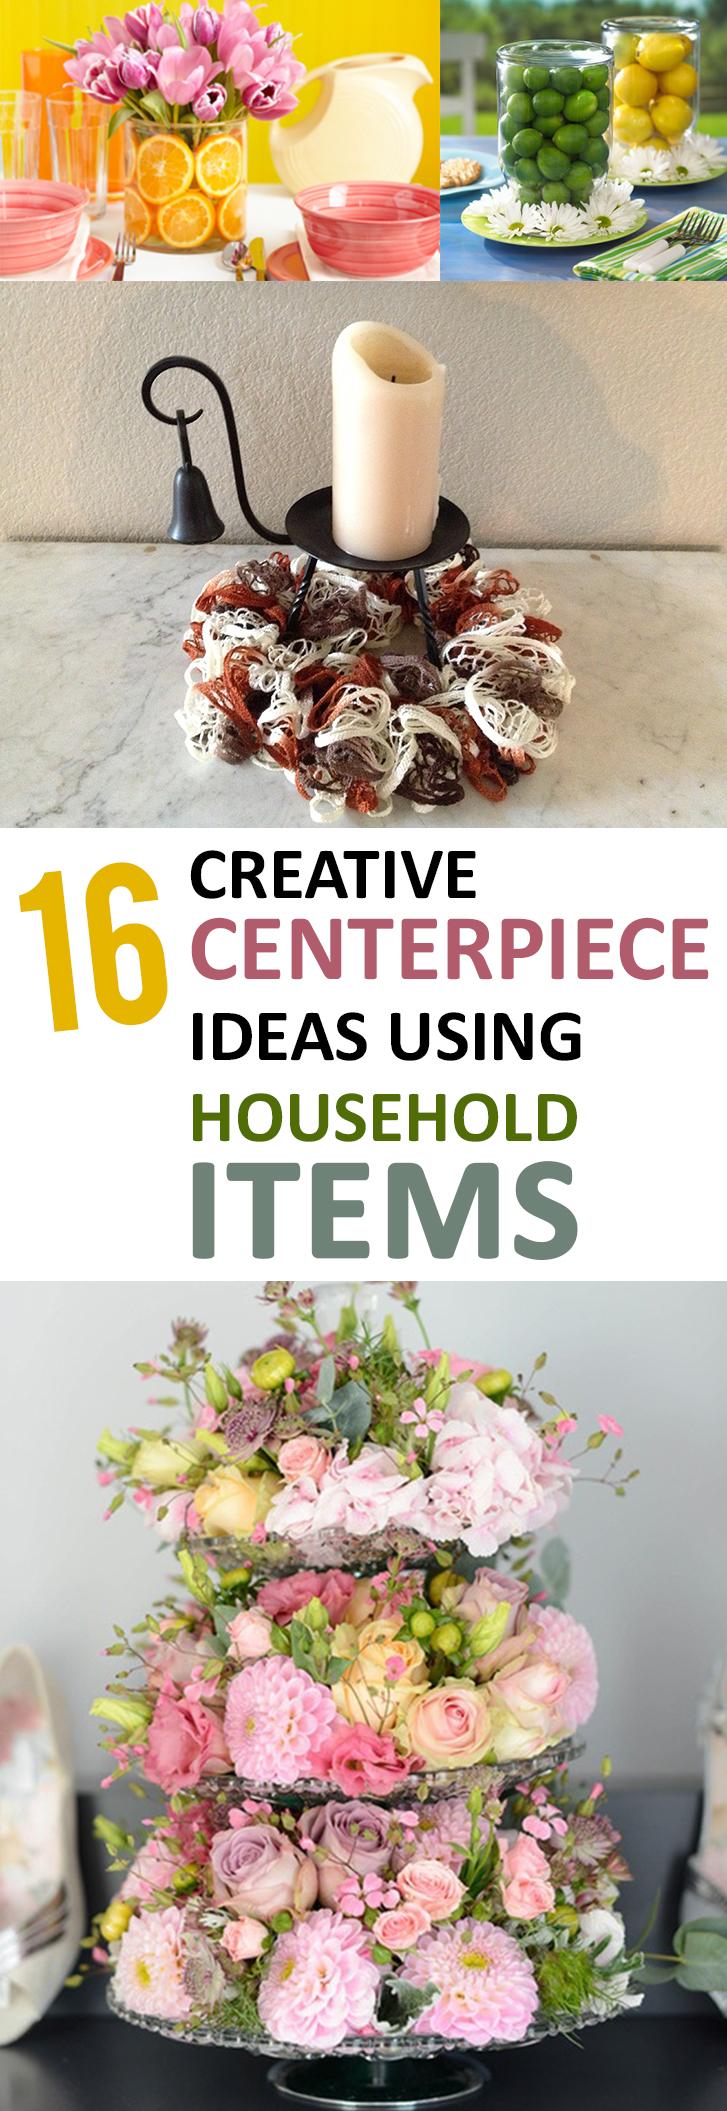 16 Creative Centerpiece Ideas Using Household Items